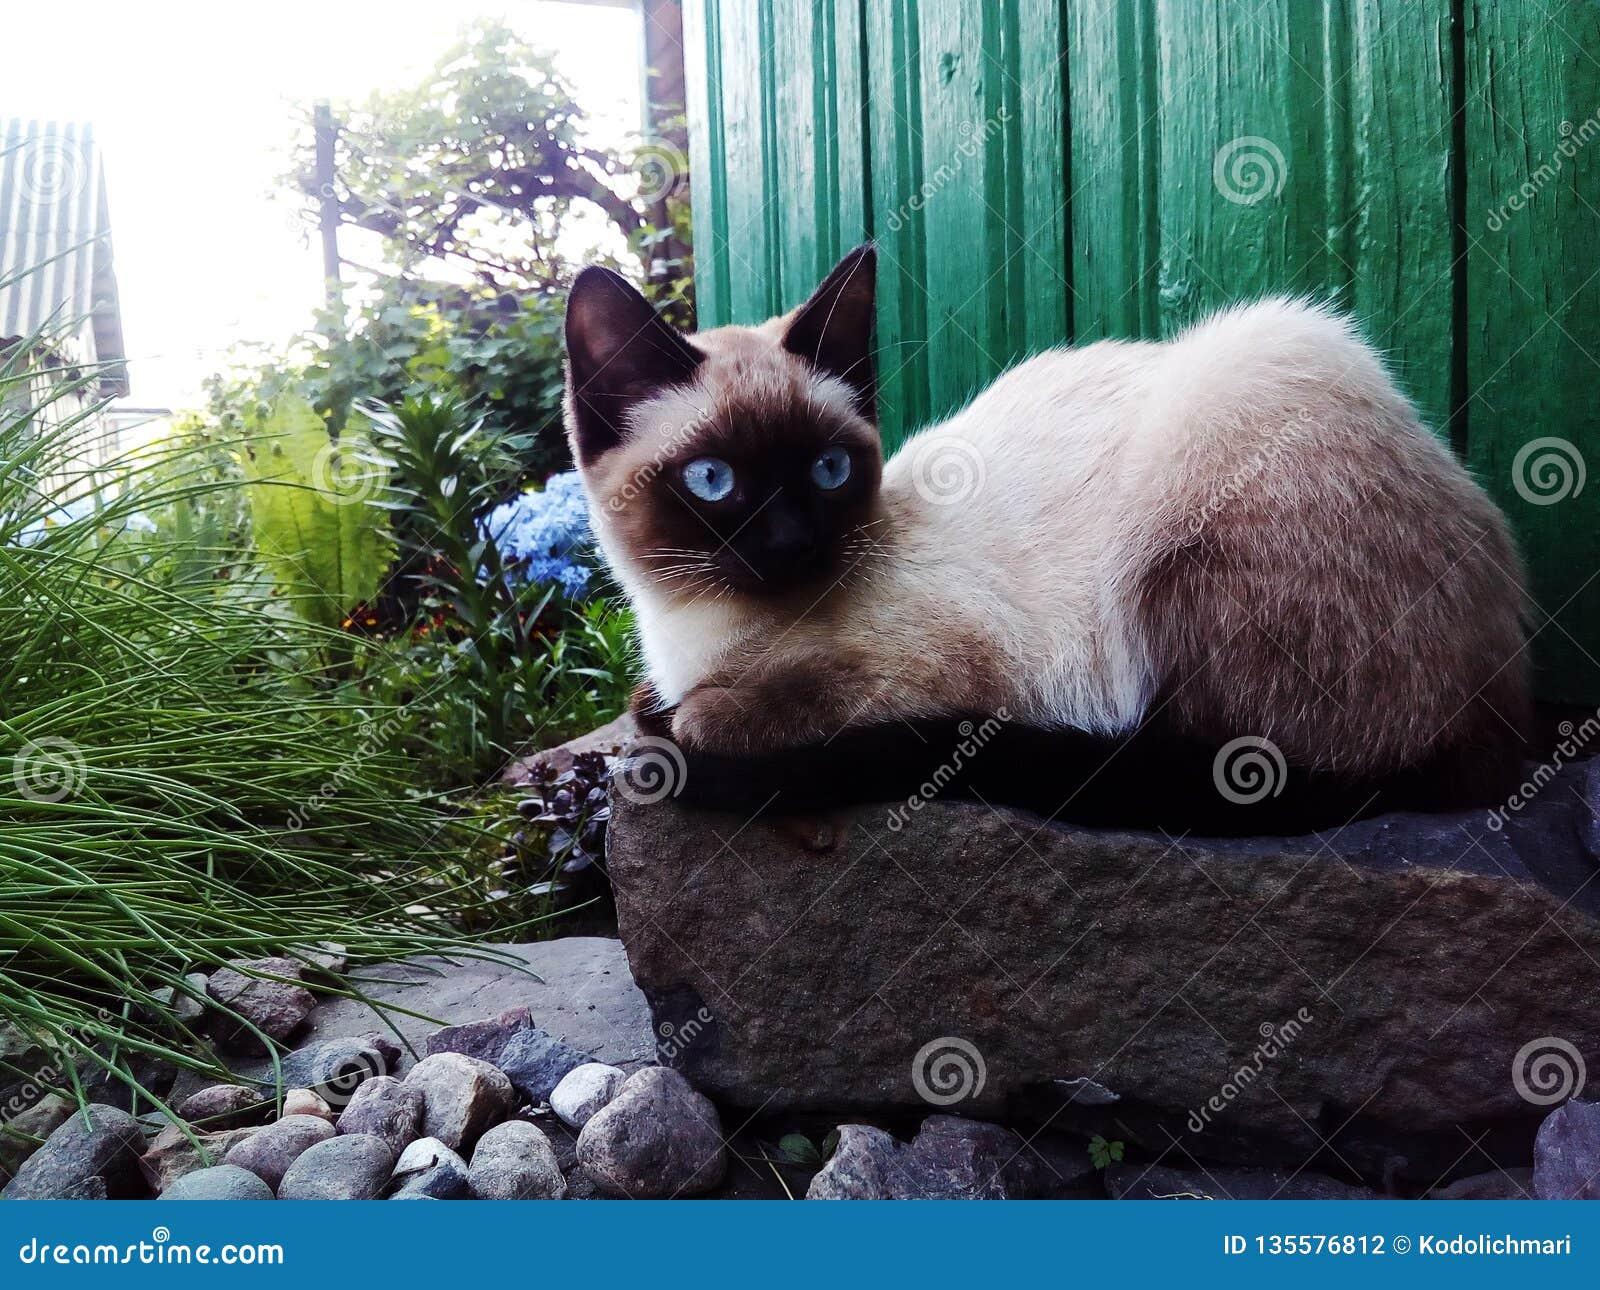 All-focus,cat, Siamese, cute animal, blue eyes